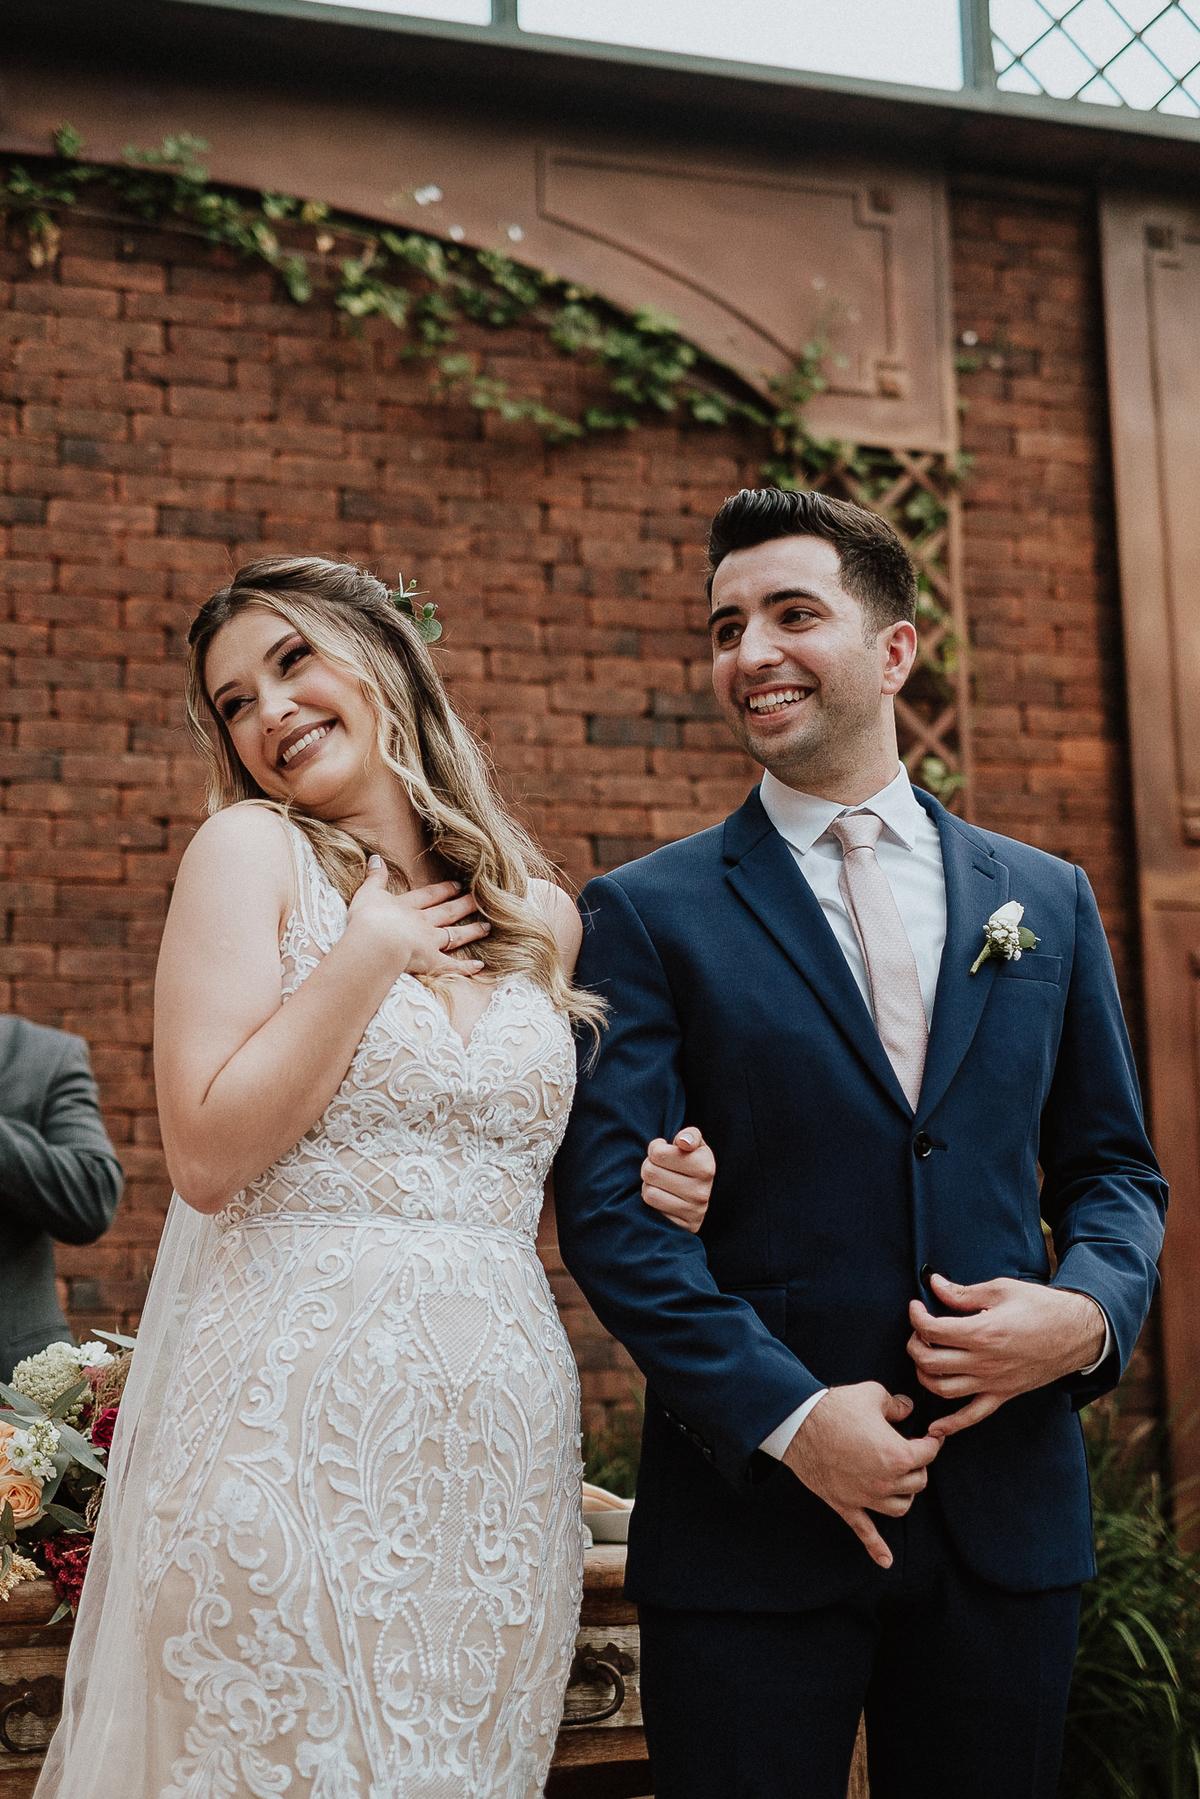 fotos por caio henrique cerimonia no campo sitio sao jorge casamento cristao entrada das aliancas